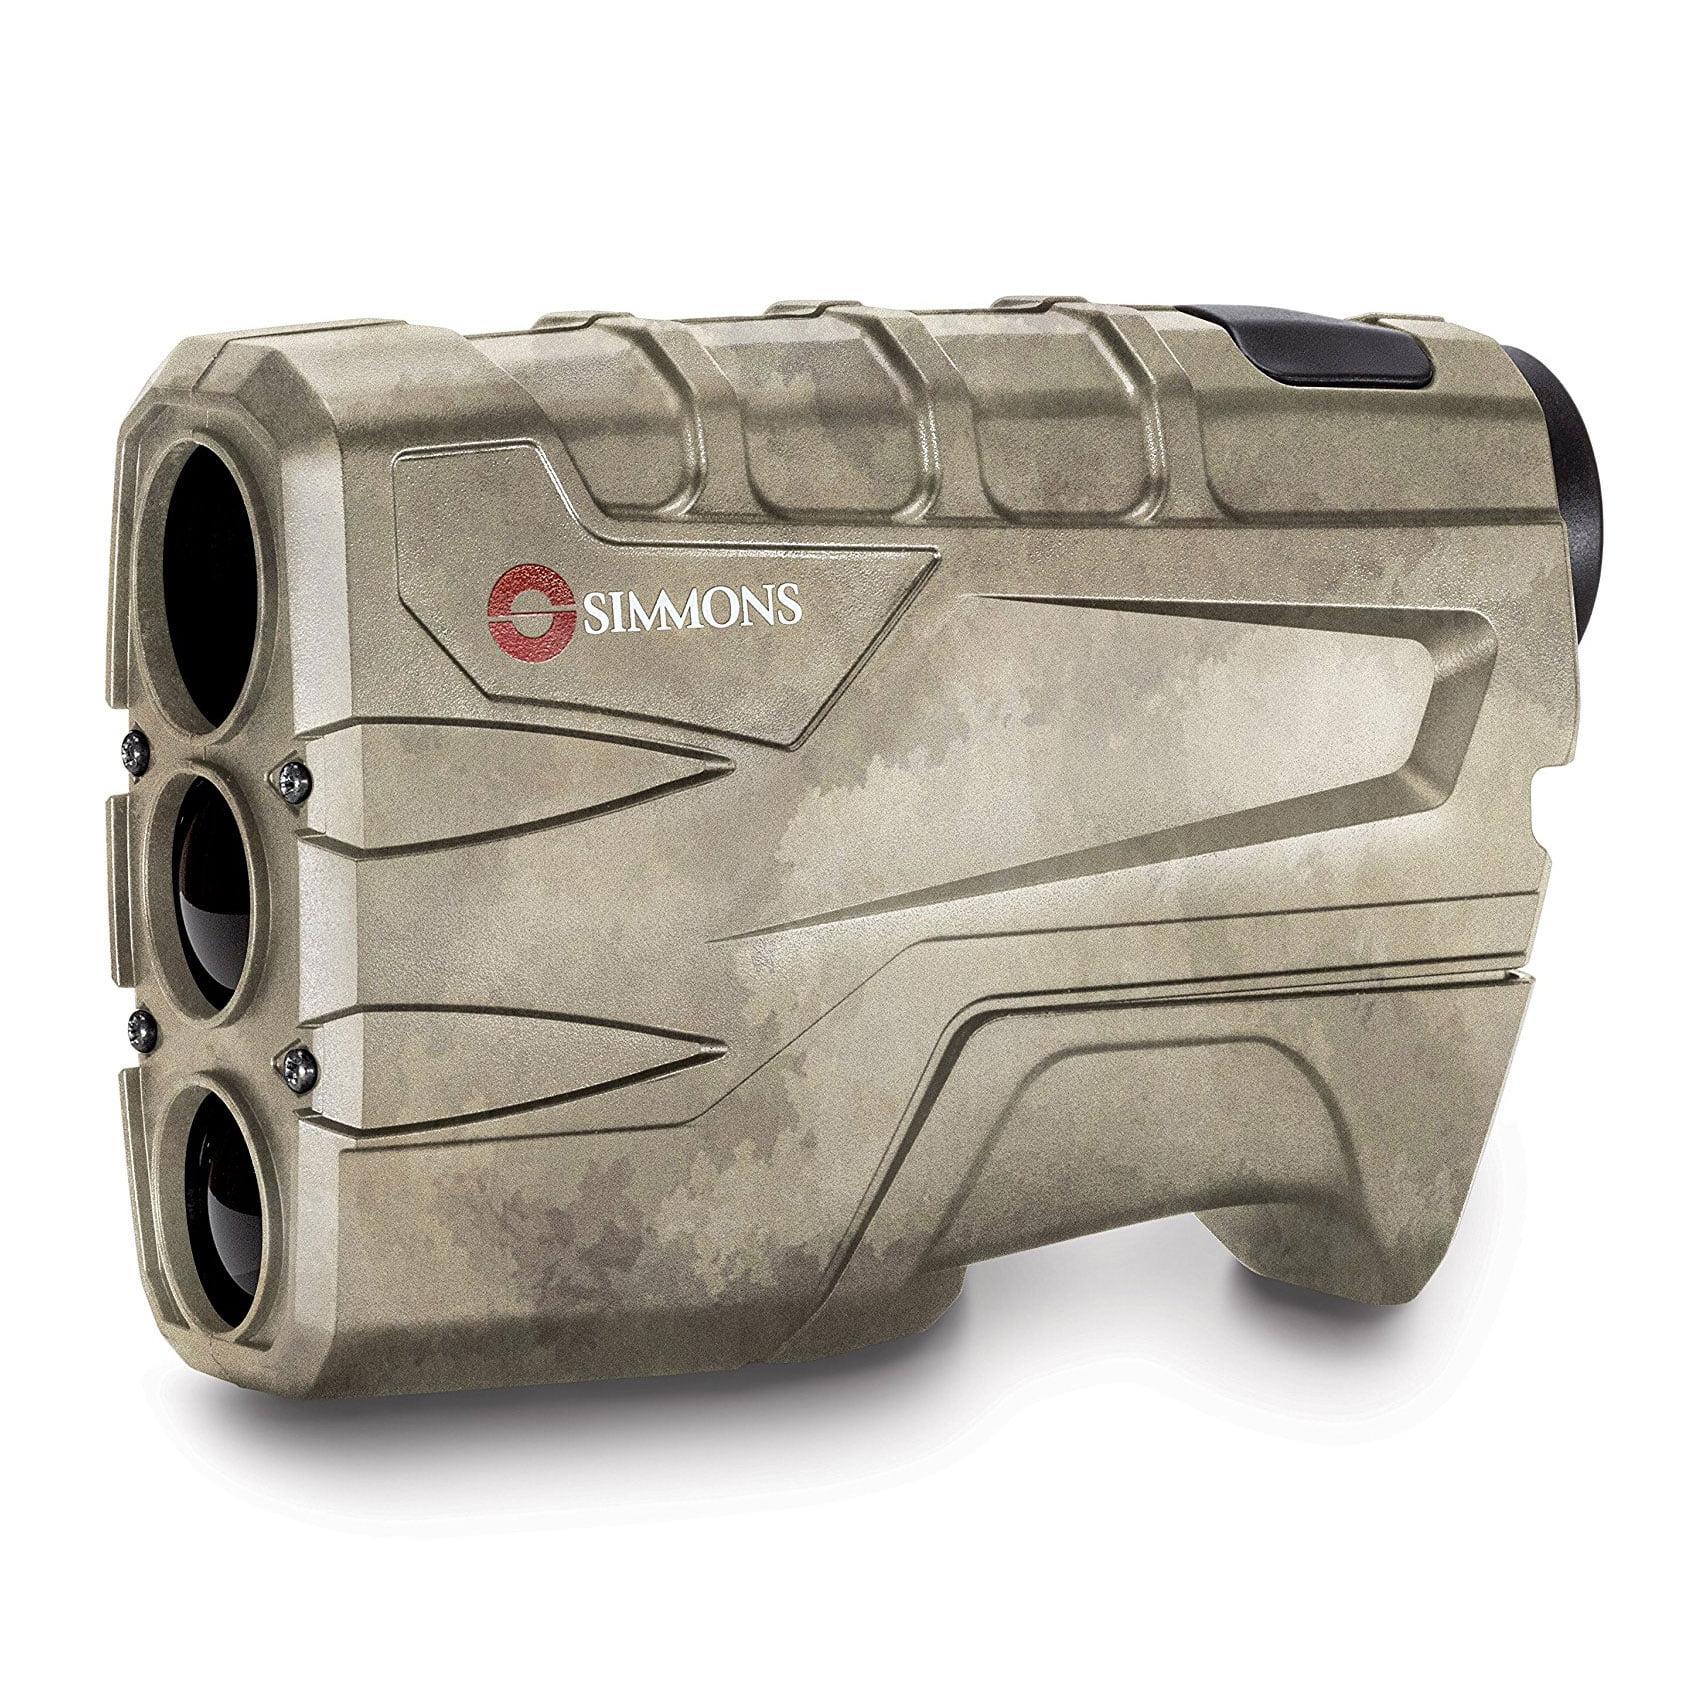 Simmons Volt 600 Laser Rangefinder by Generic